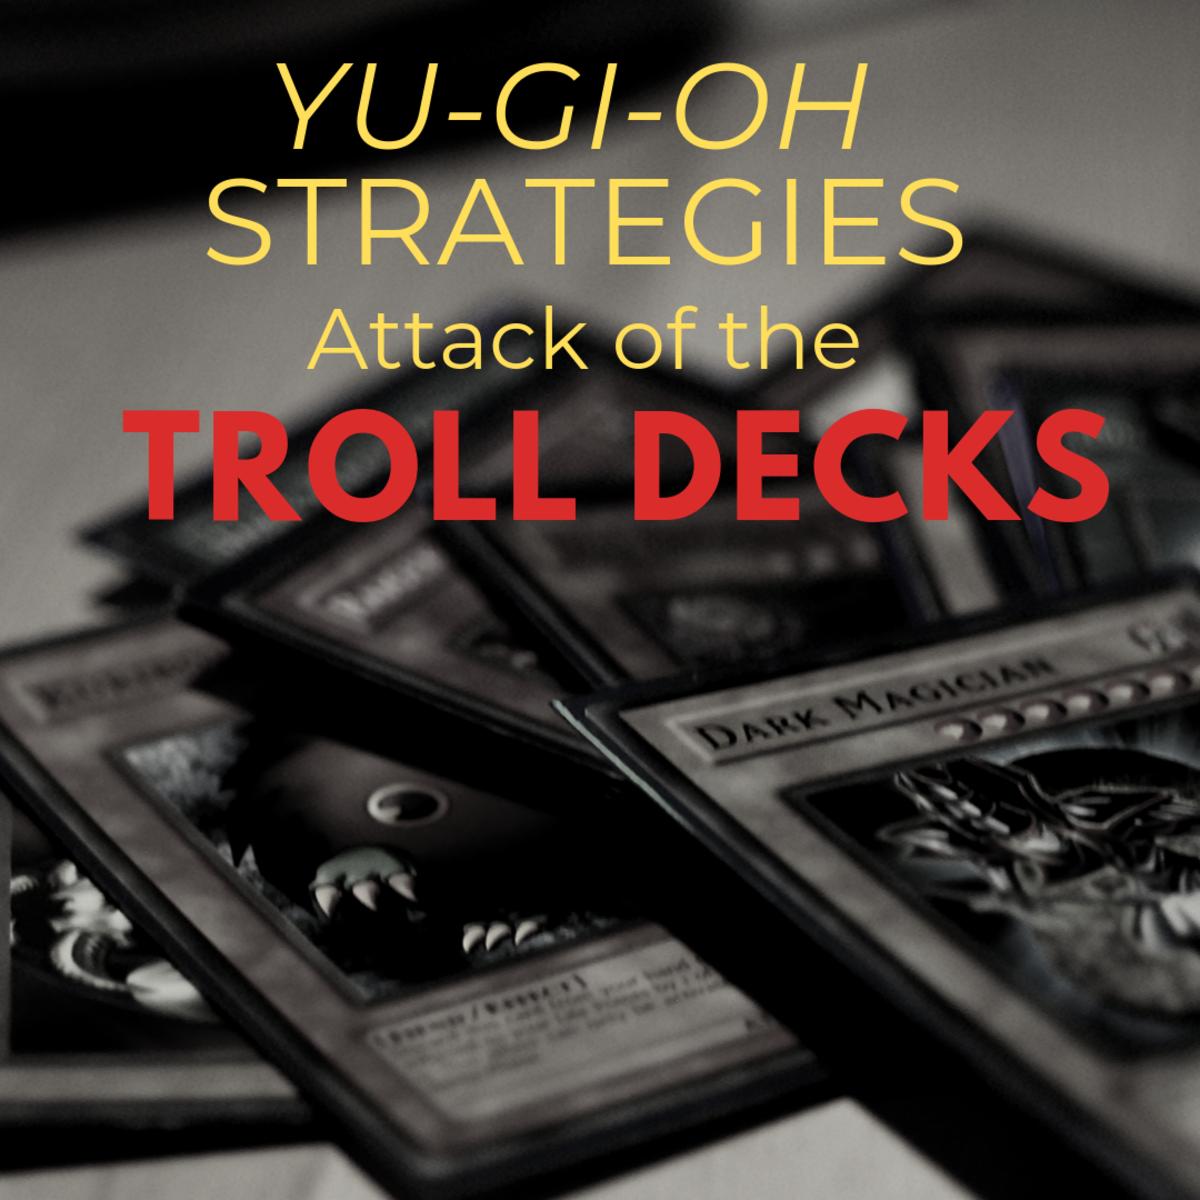 Yu-Gi-Oh Strategies—Attack of the Troll Decks